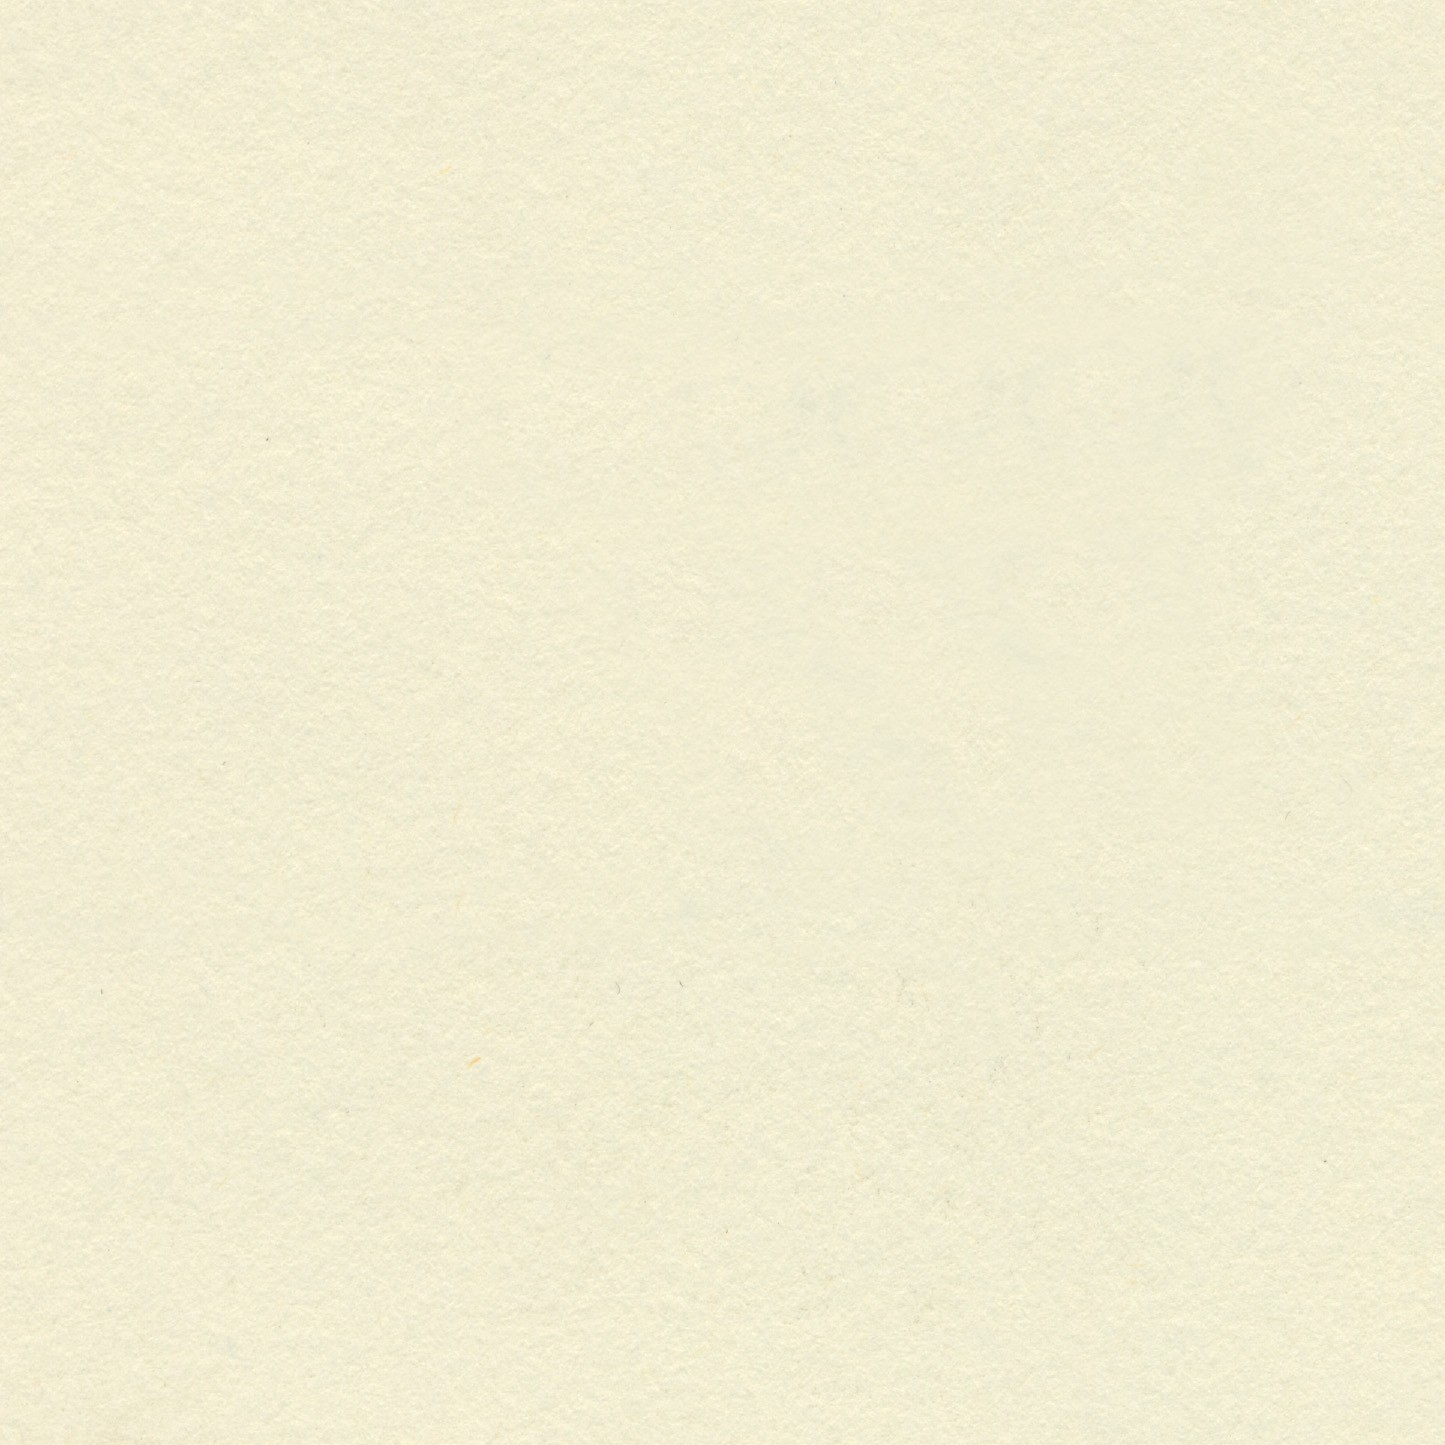 Cream - Ivory 150gsm